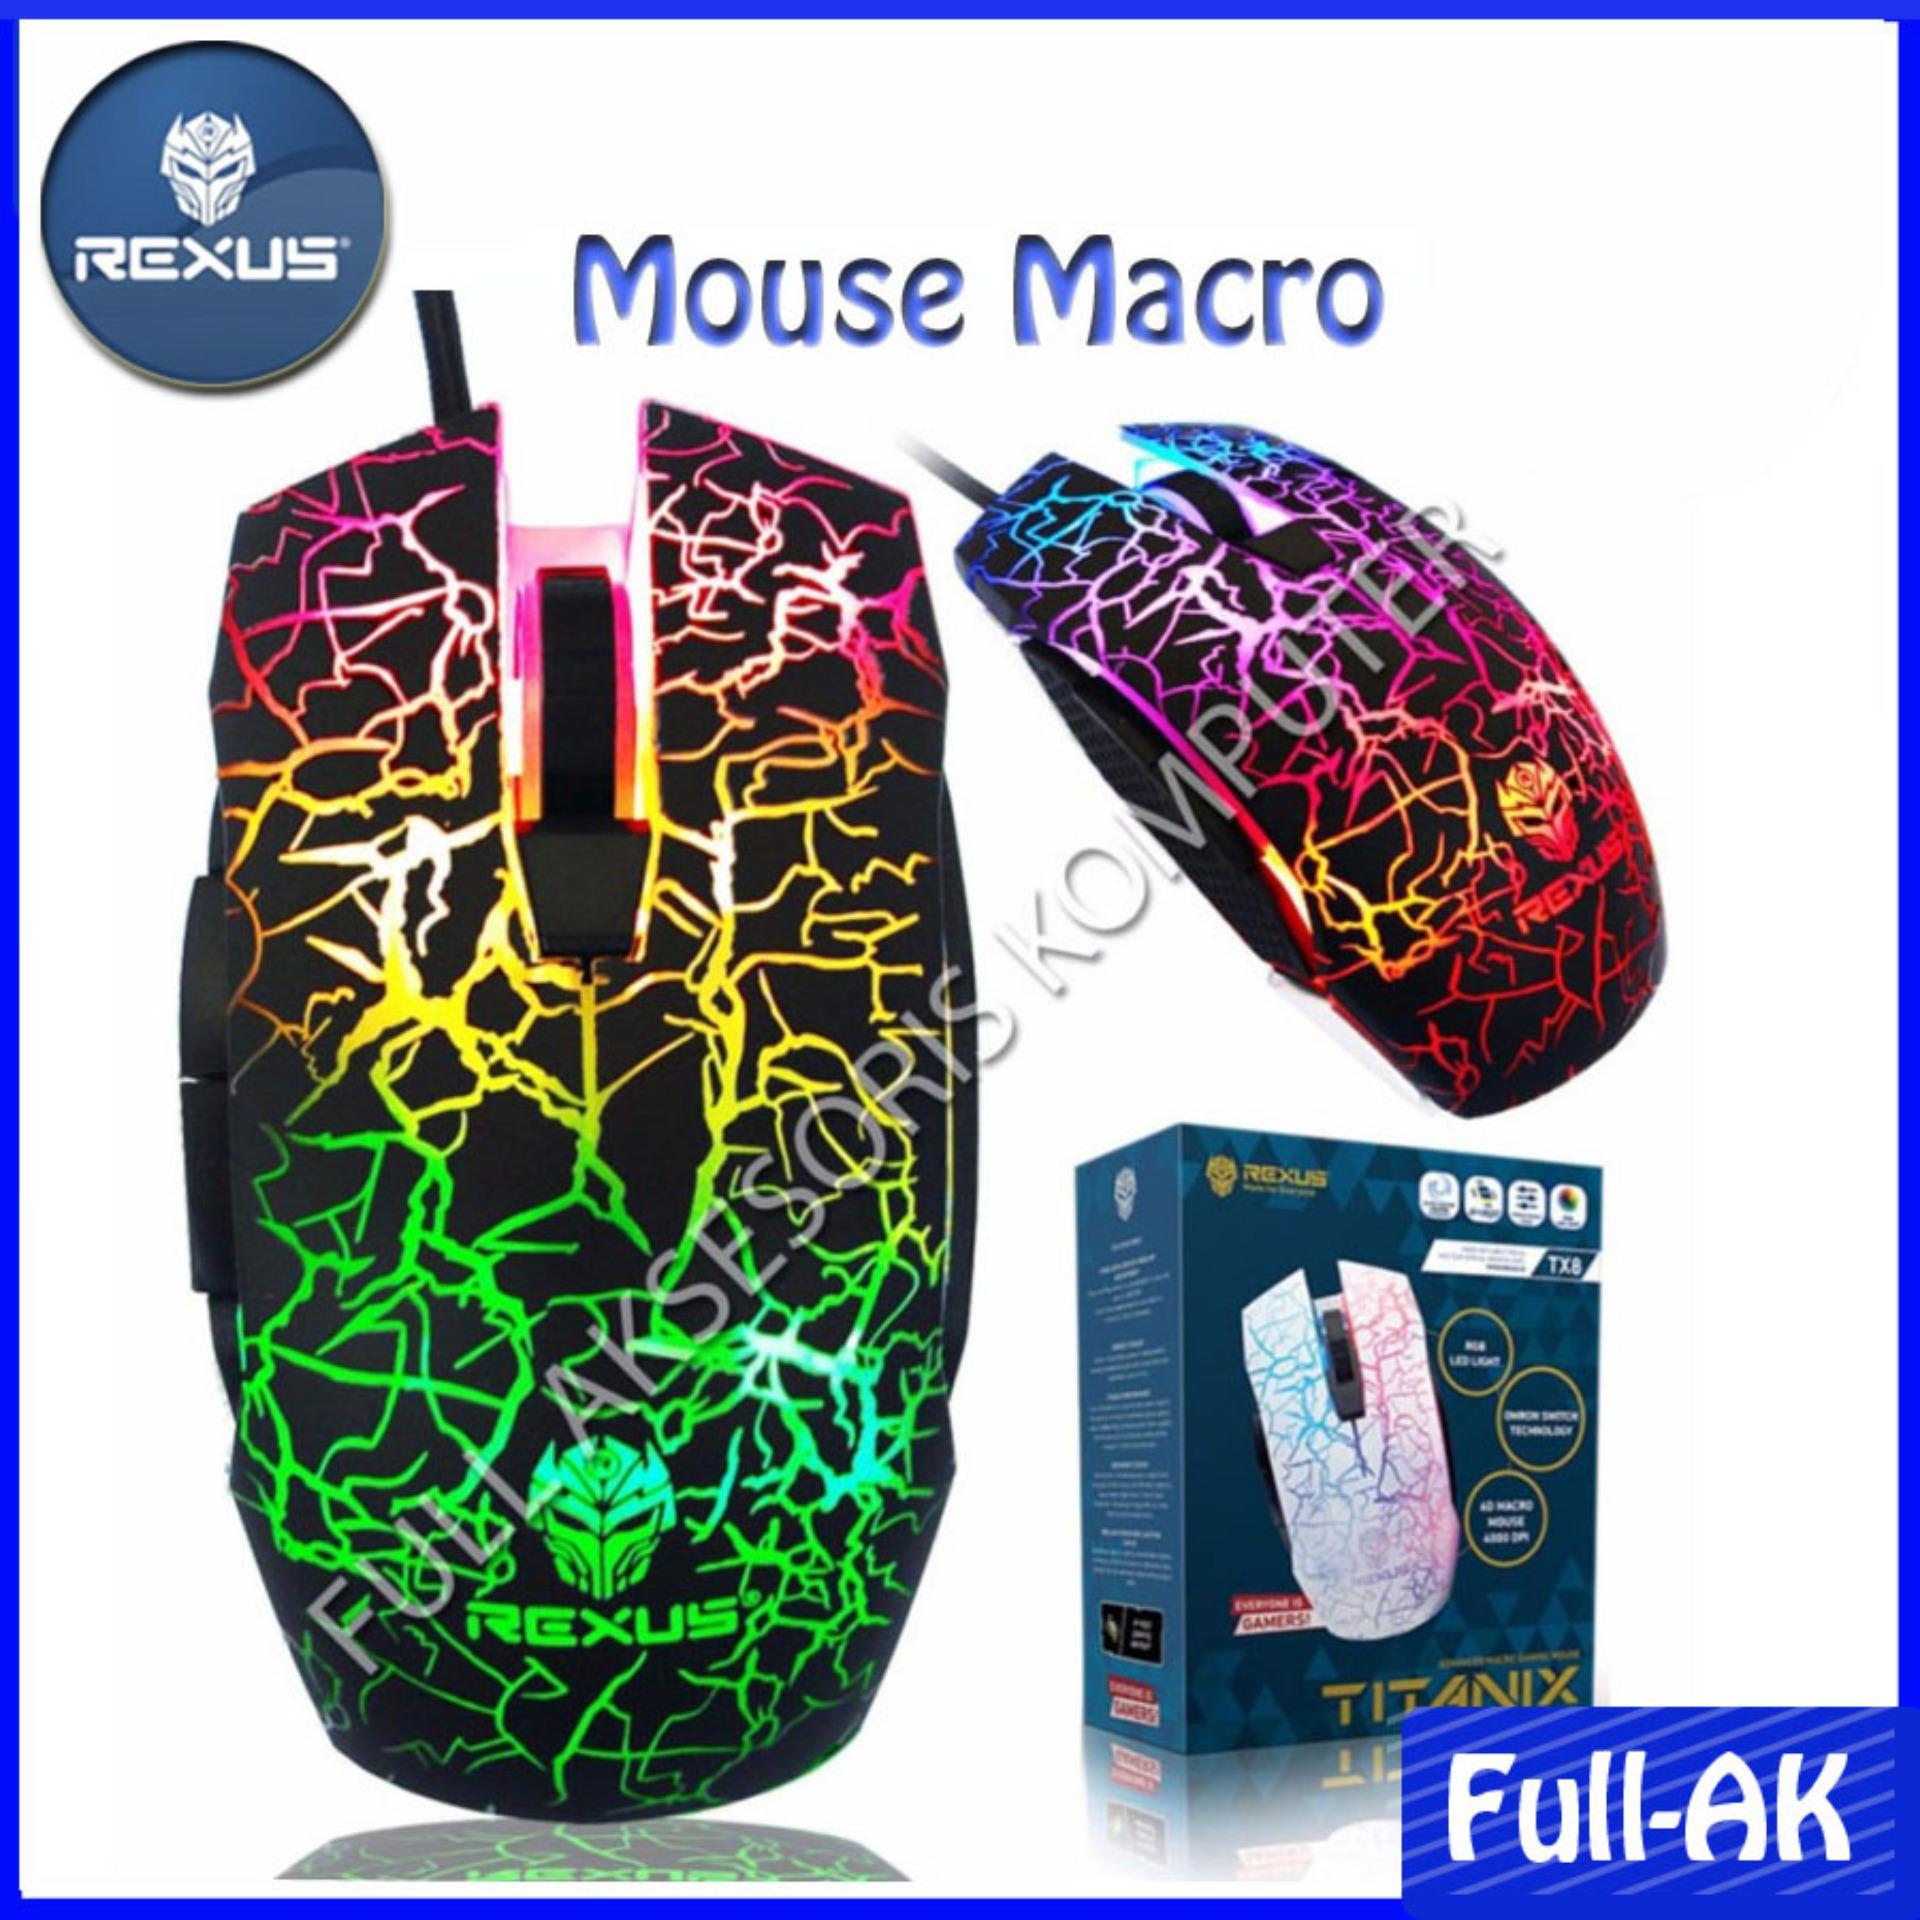 Marvo K400 Gaming Keyboard Usb With 3 Colors Led Hitam Daftar B3 Rexus Tx8 Macro Mouse 6d Rainbow